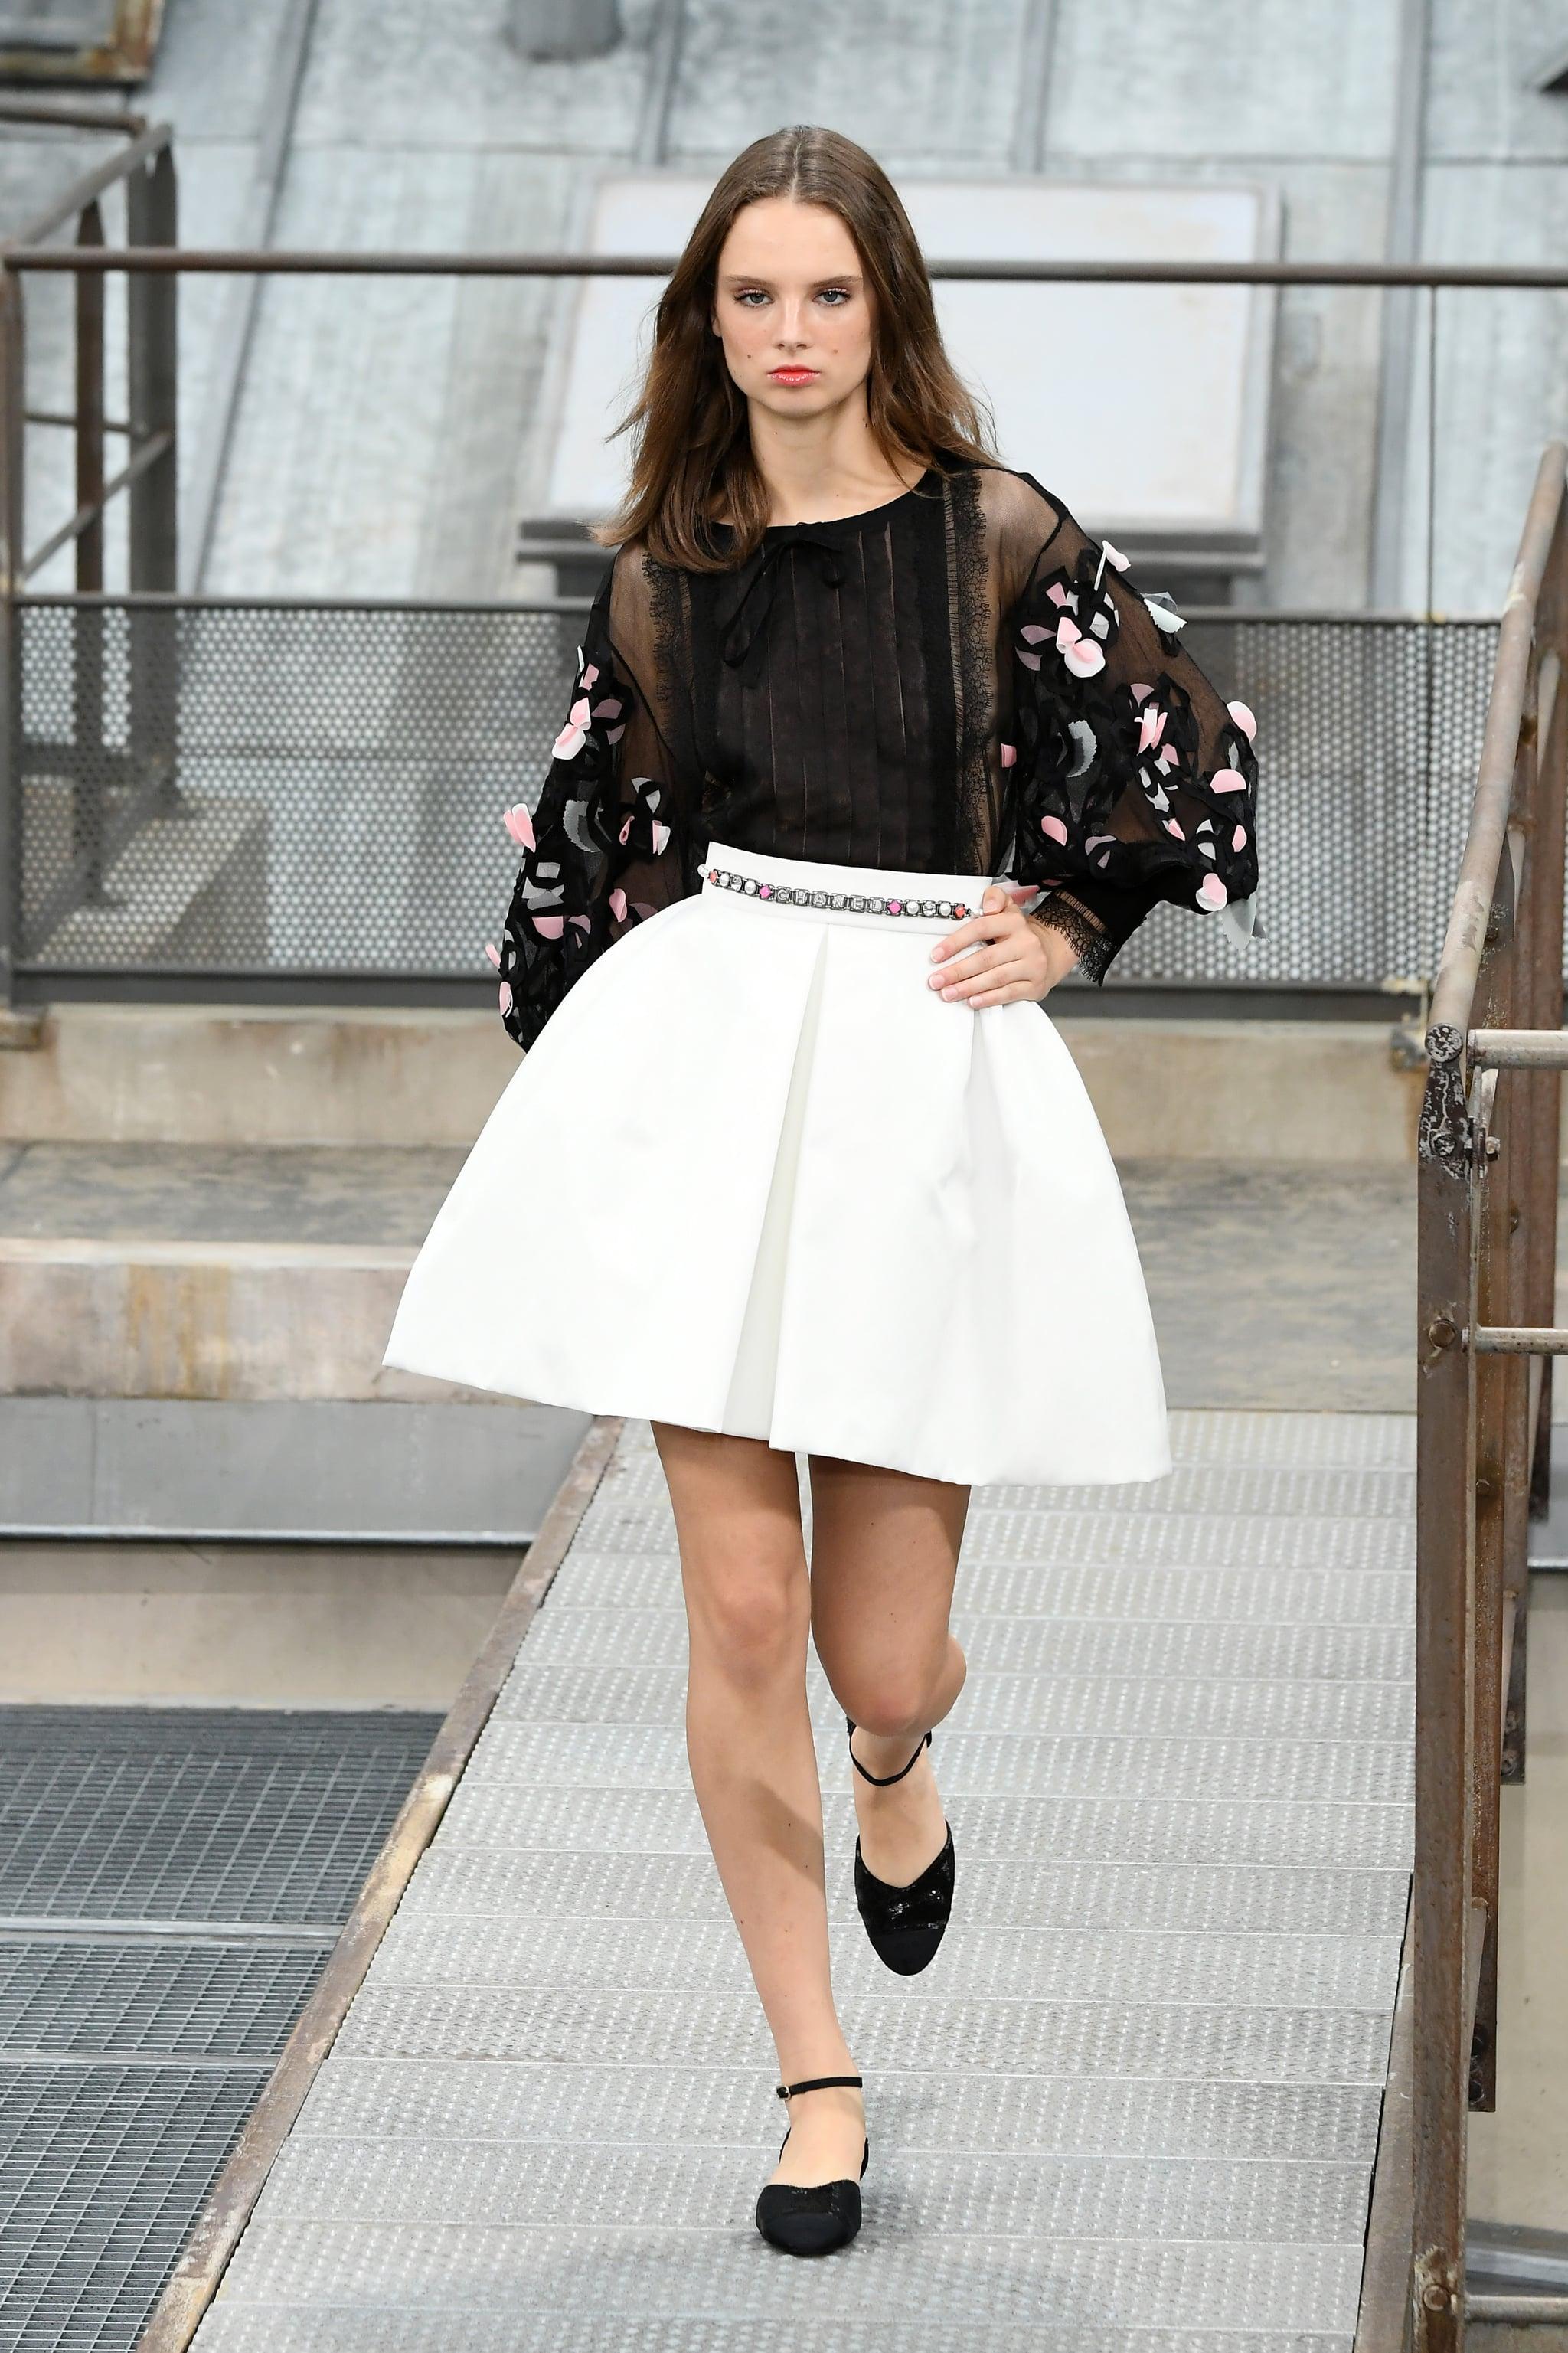 Chanel Summer 2020.Chanel Spring Summer 2020 Gigi Hadid And Kaia Gerber